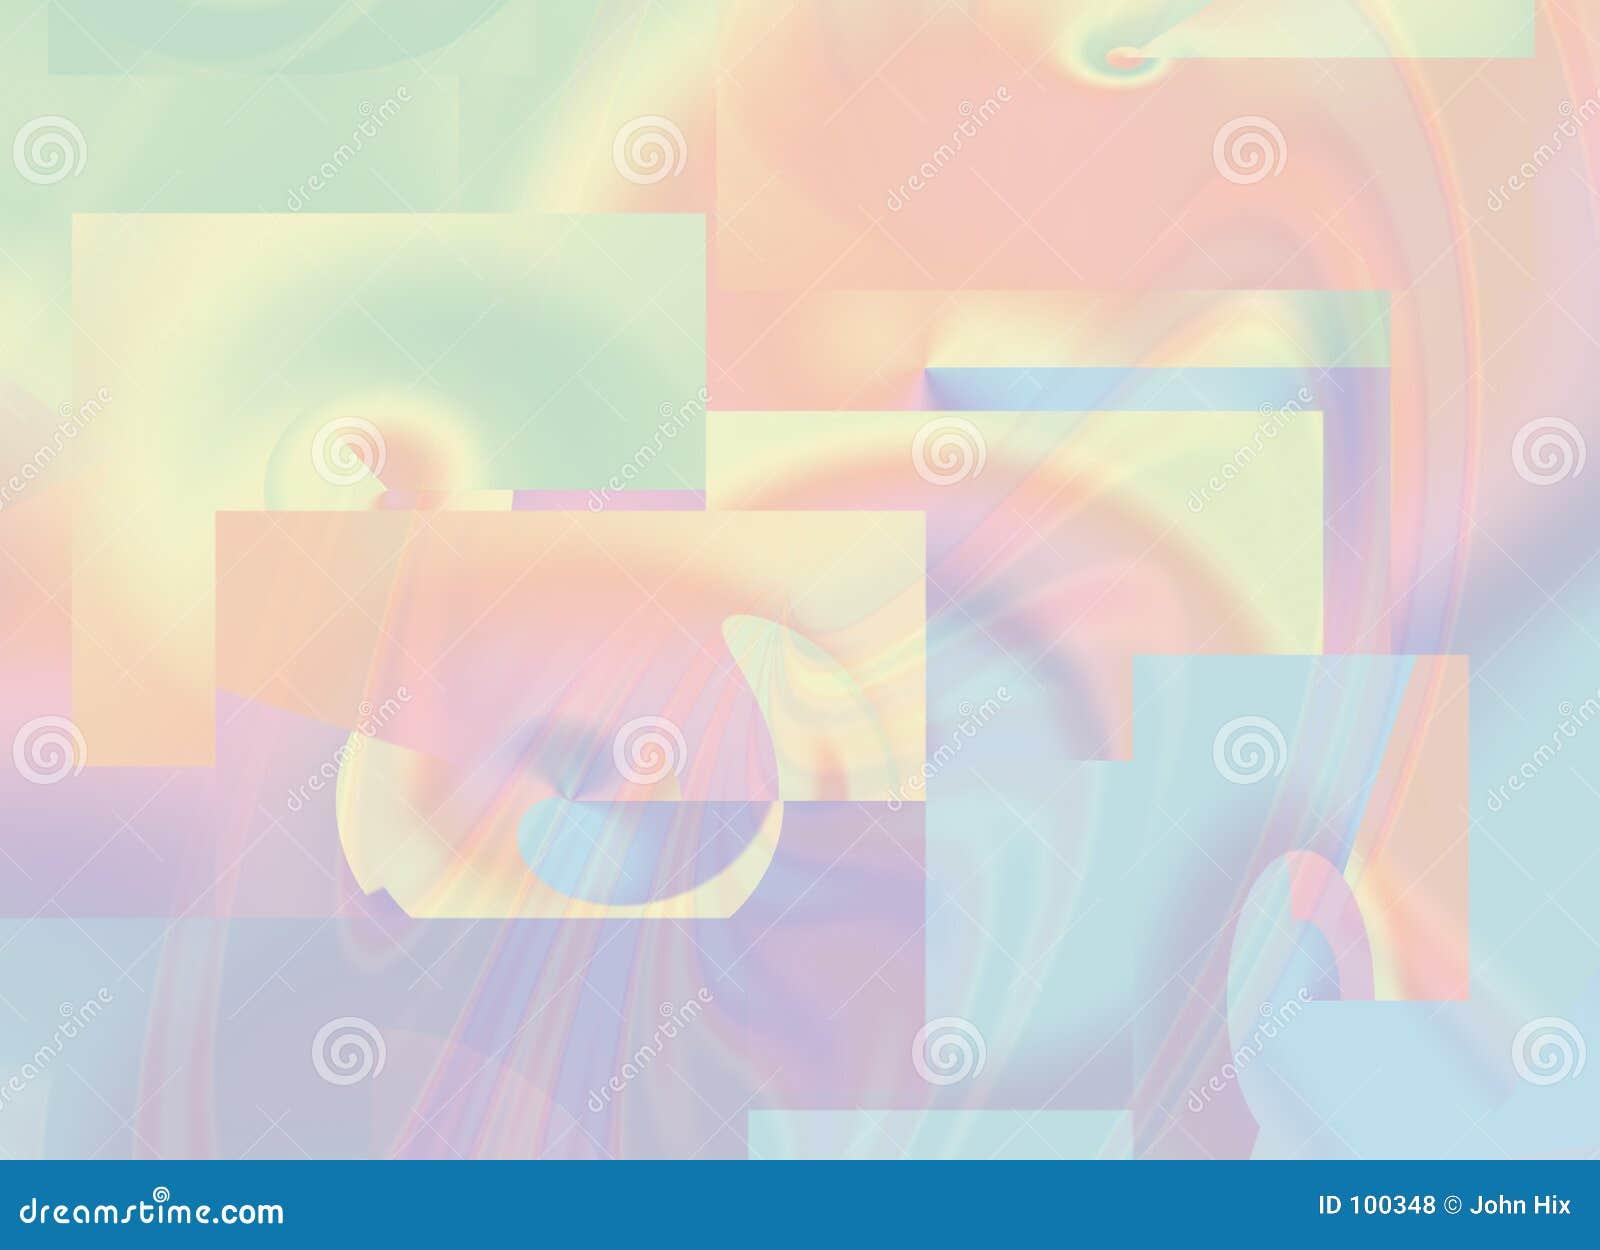 Arte do cubo